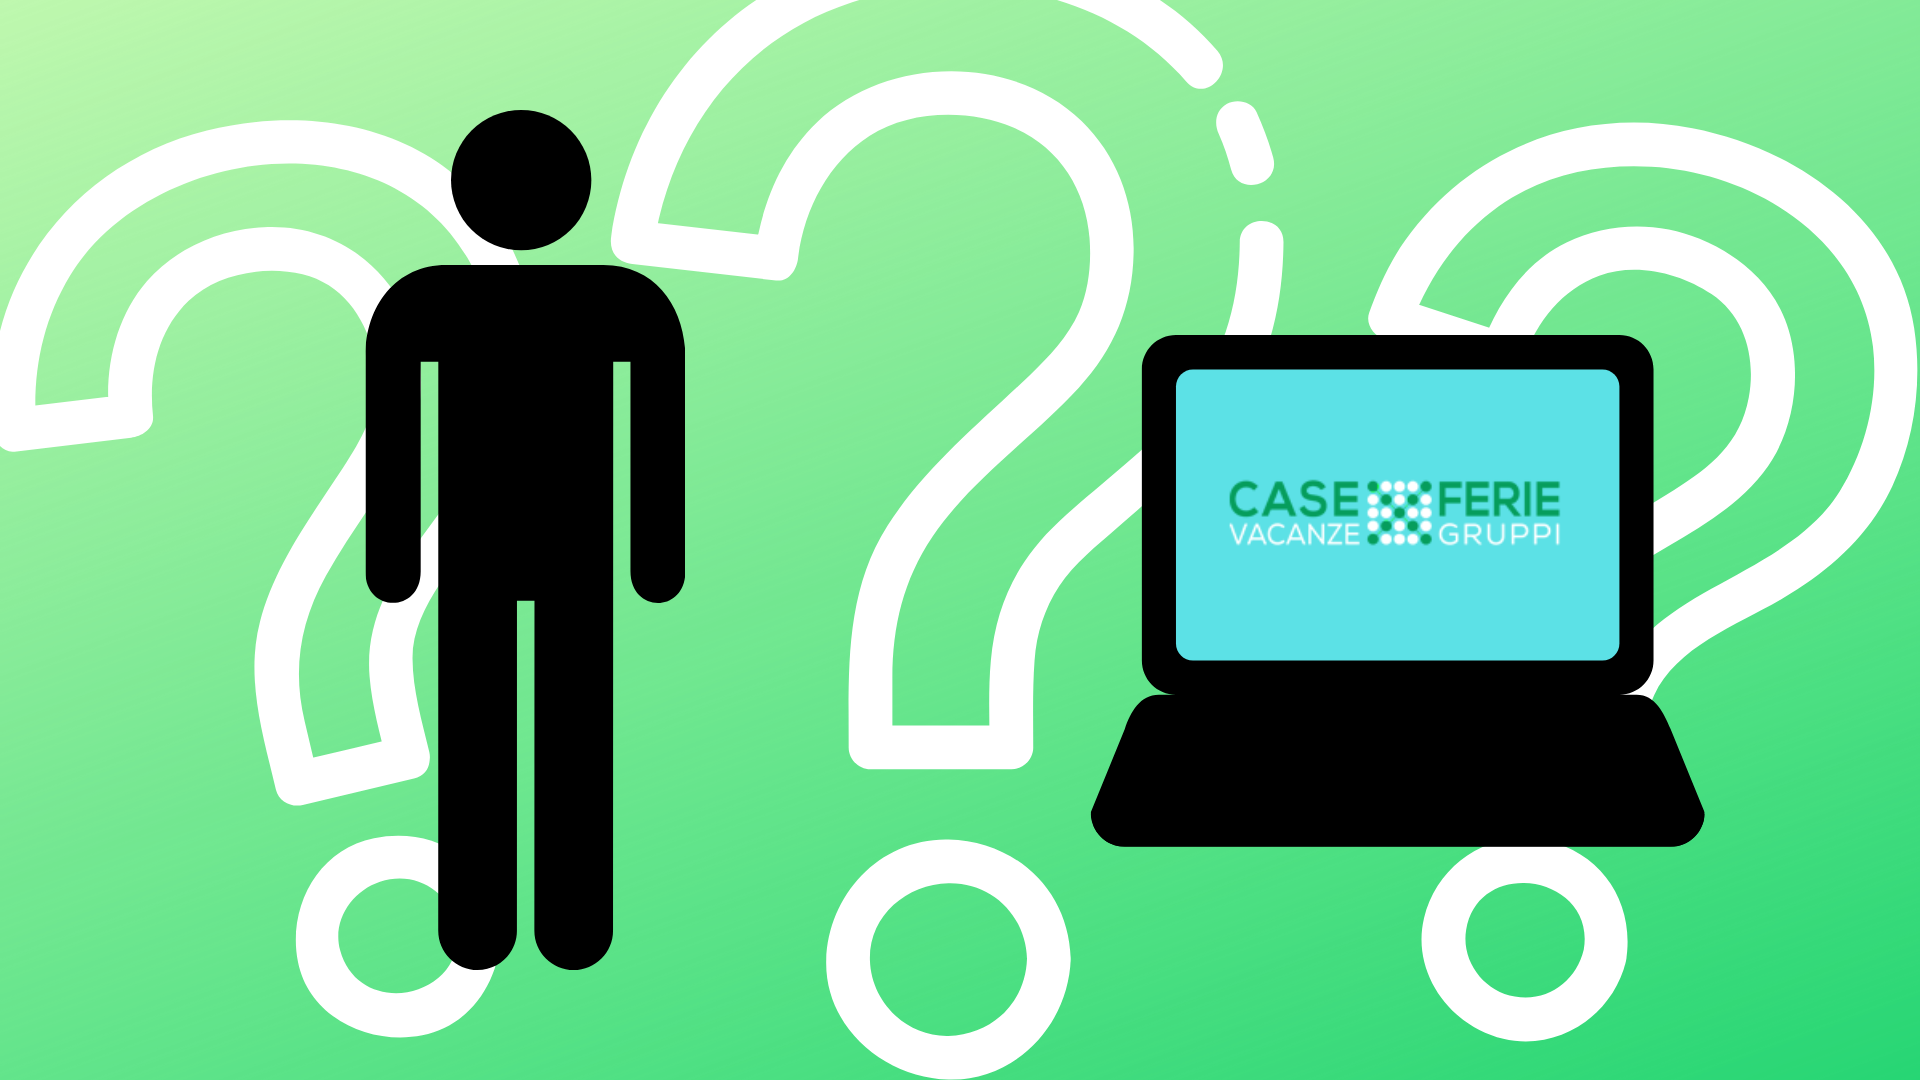 Come iscriversi al portale caseperferiepergruppi.it